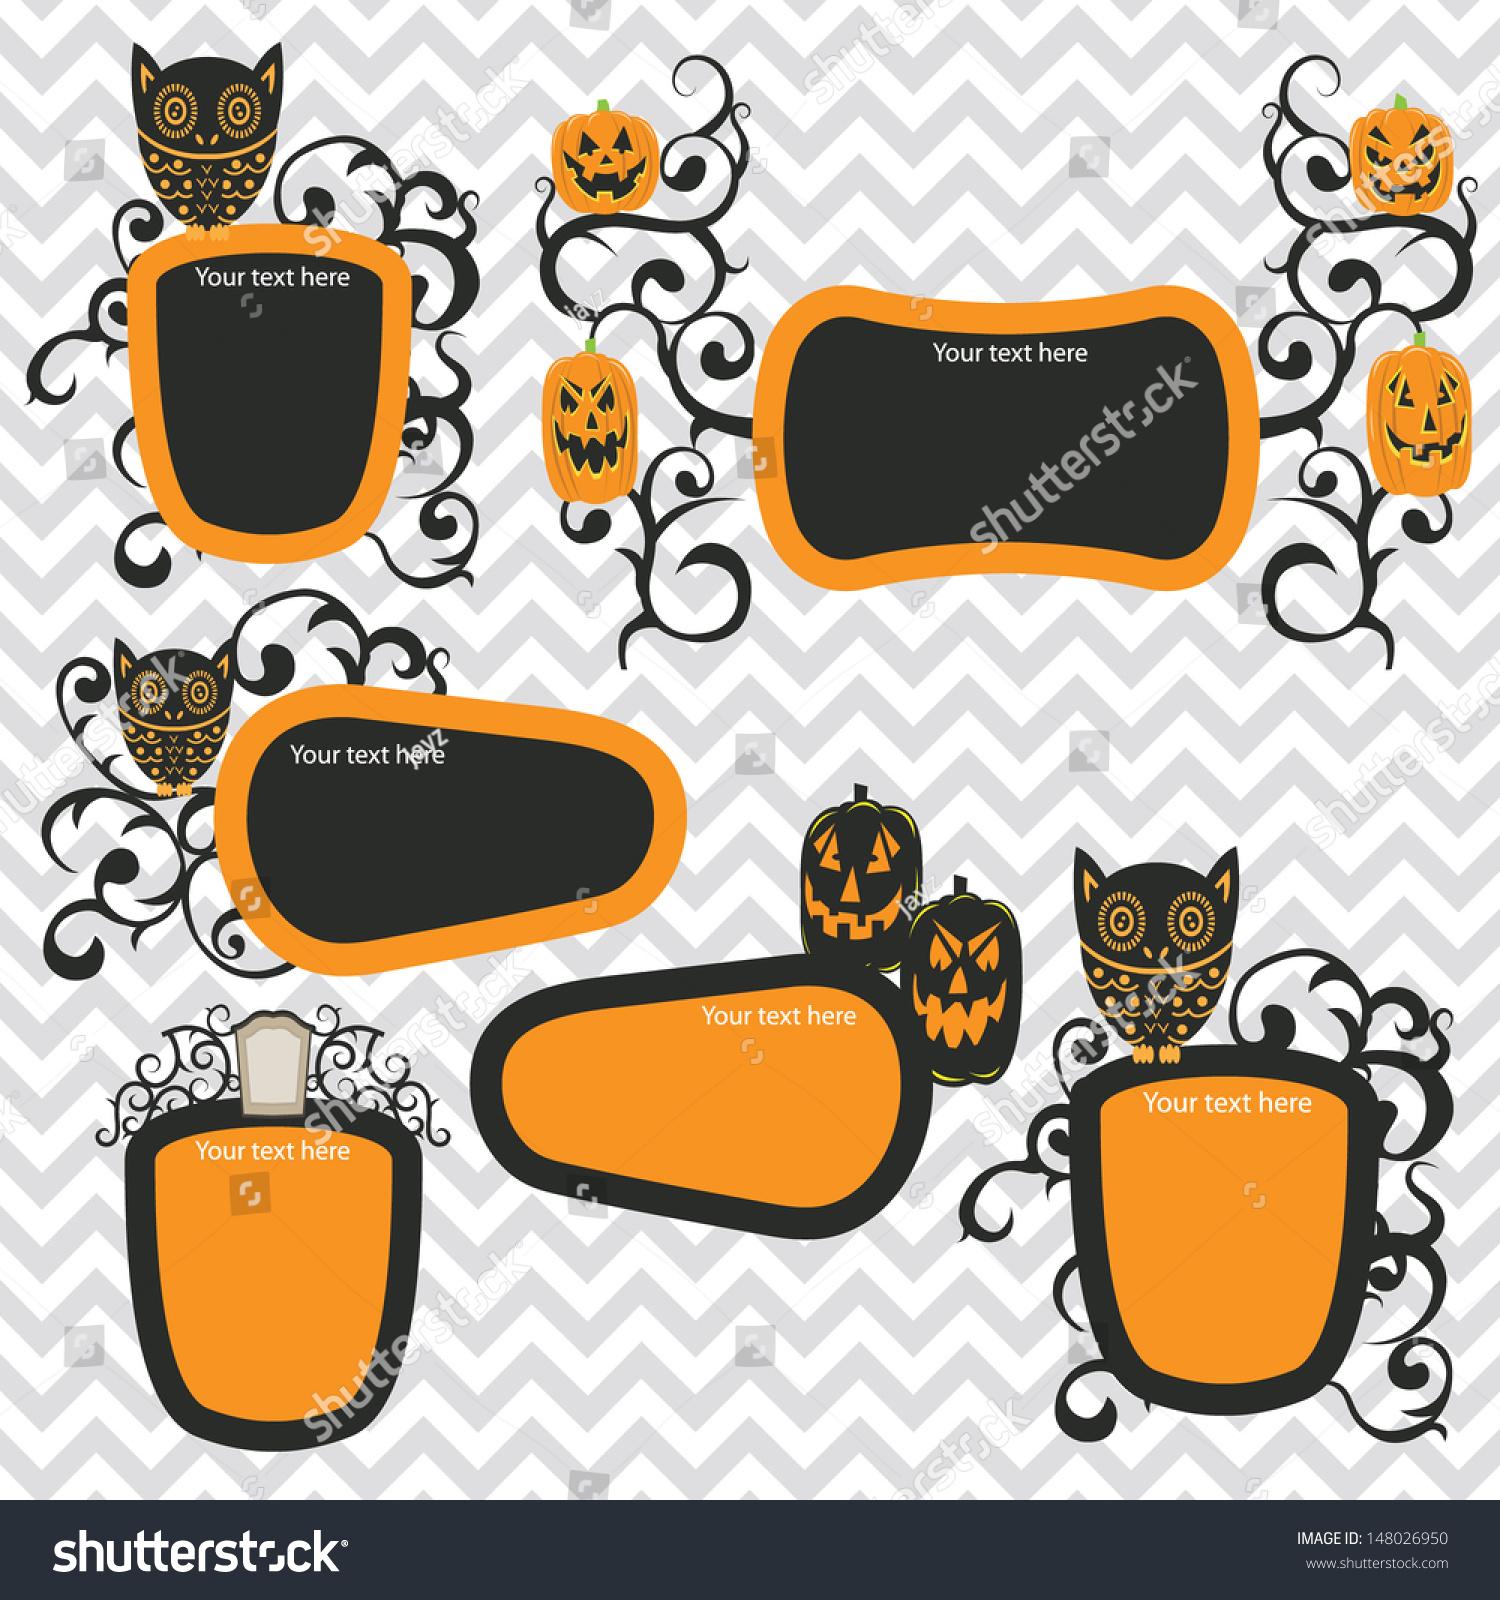 halloween frames stock vector (royalty free) 148026950 - shutterstock